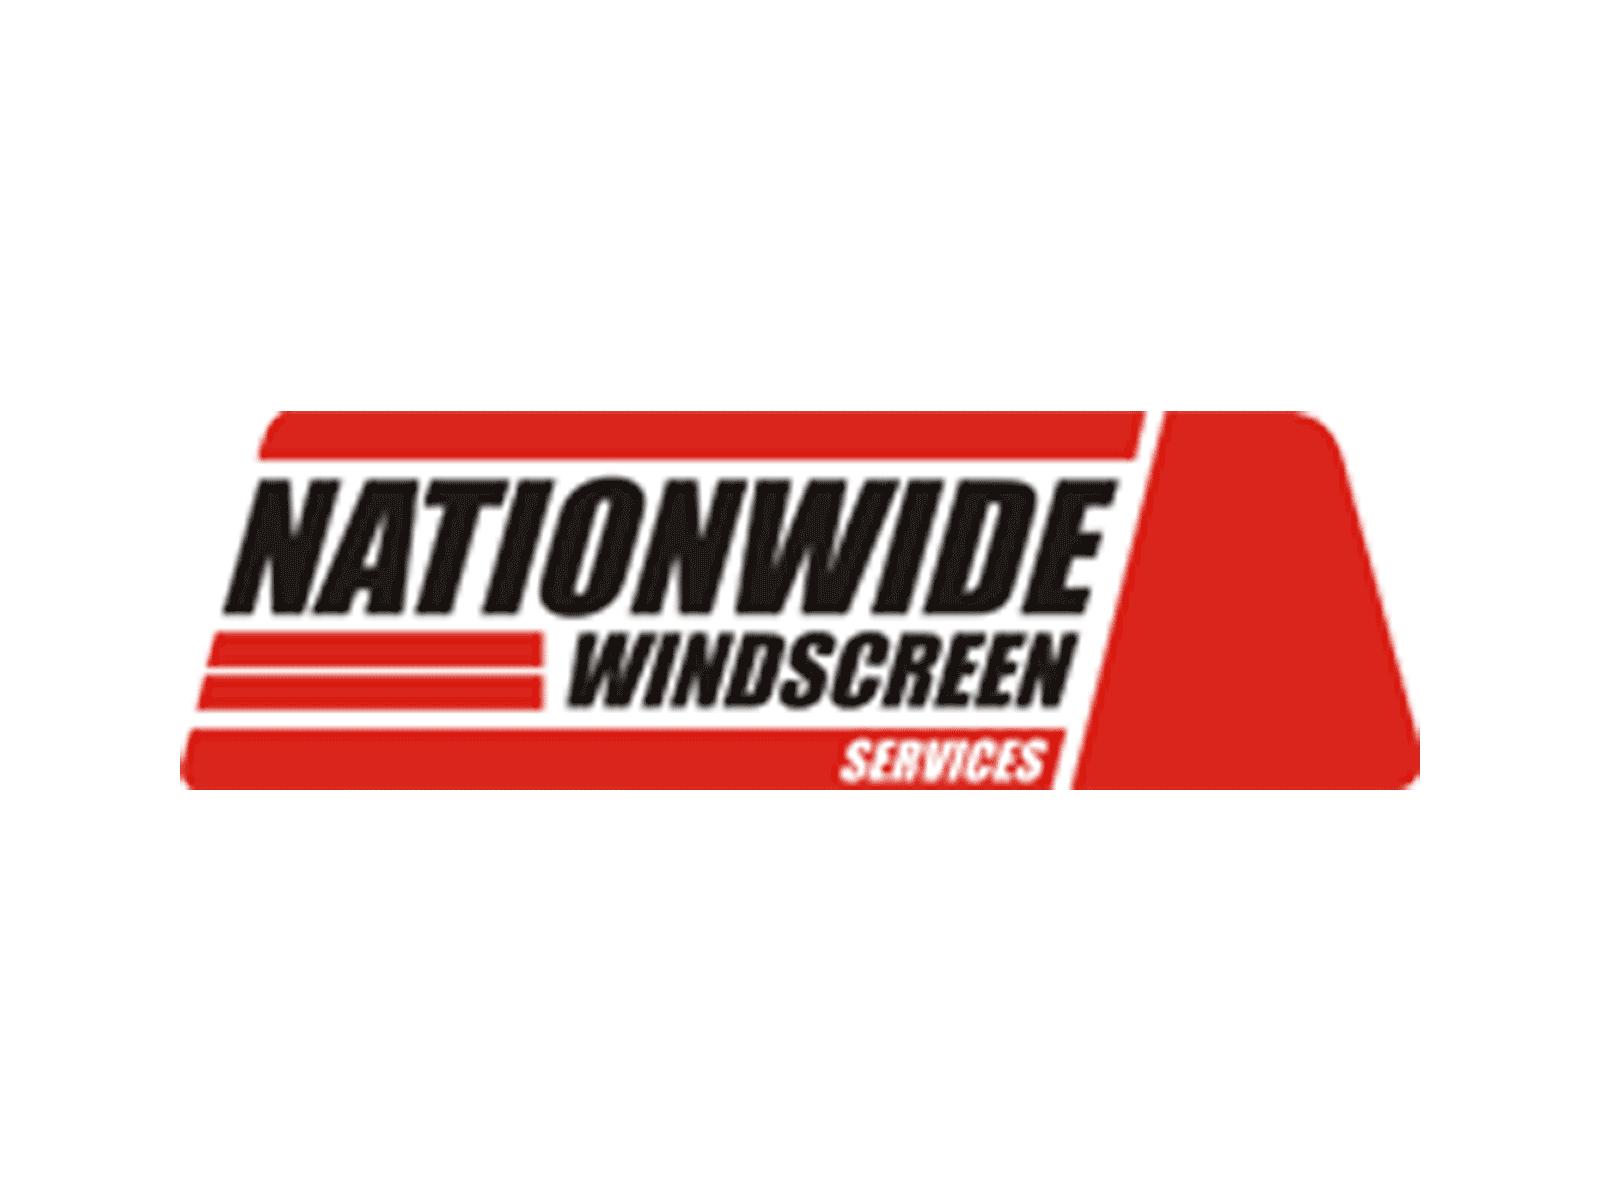 Business Partner Nationwide Windscreens